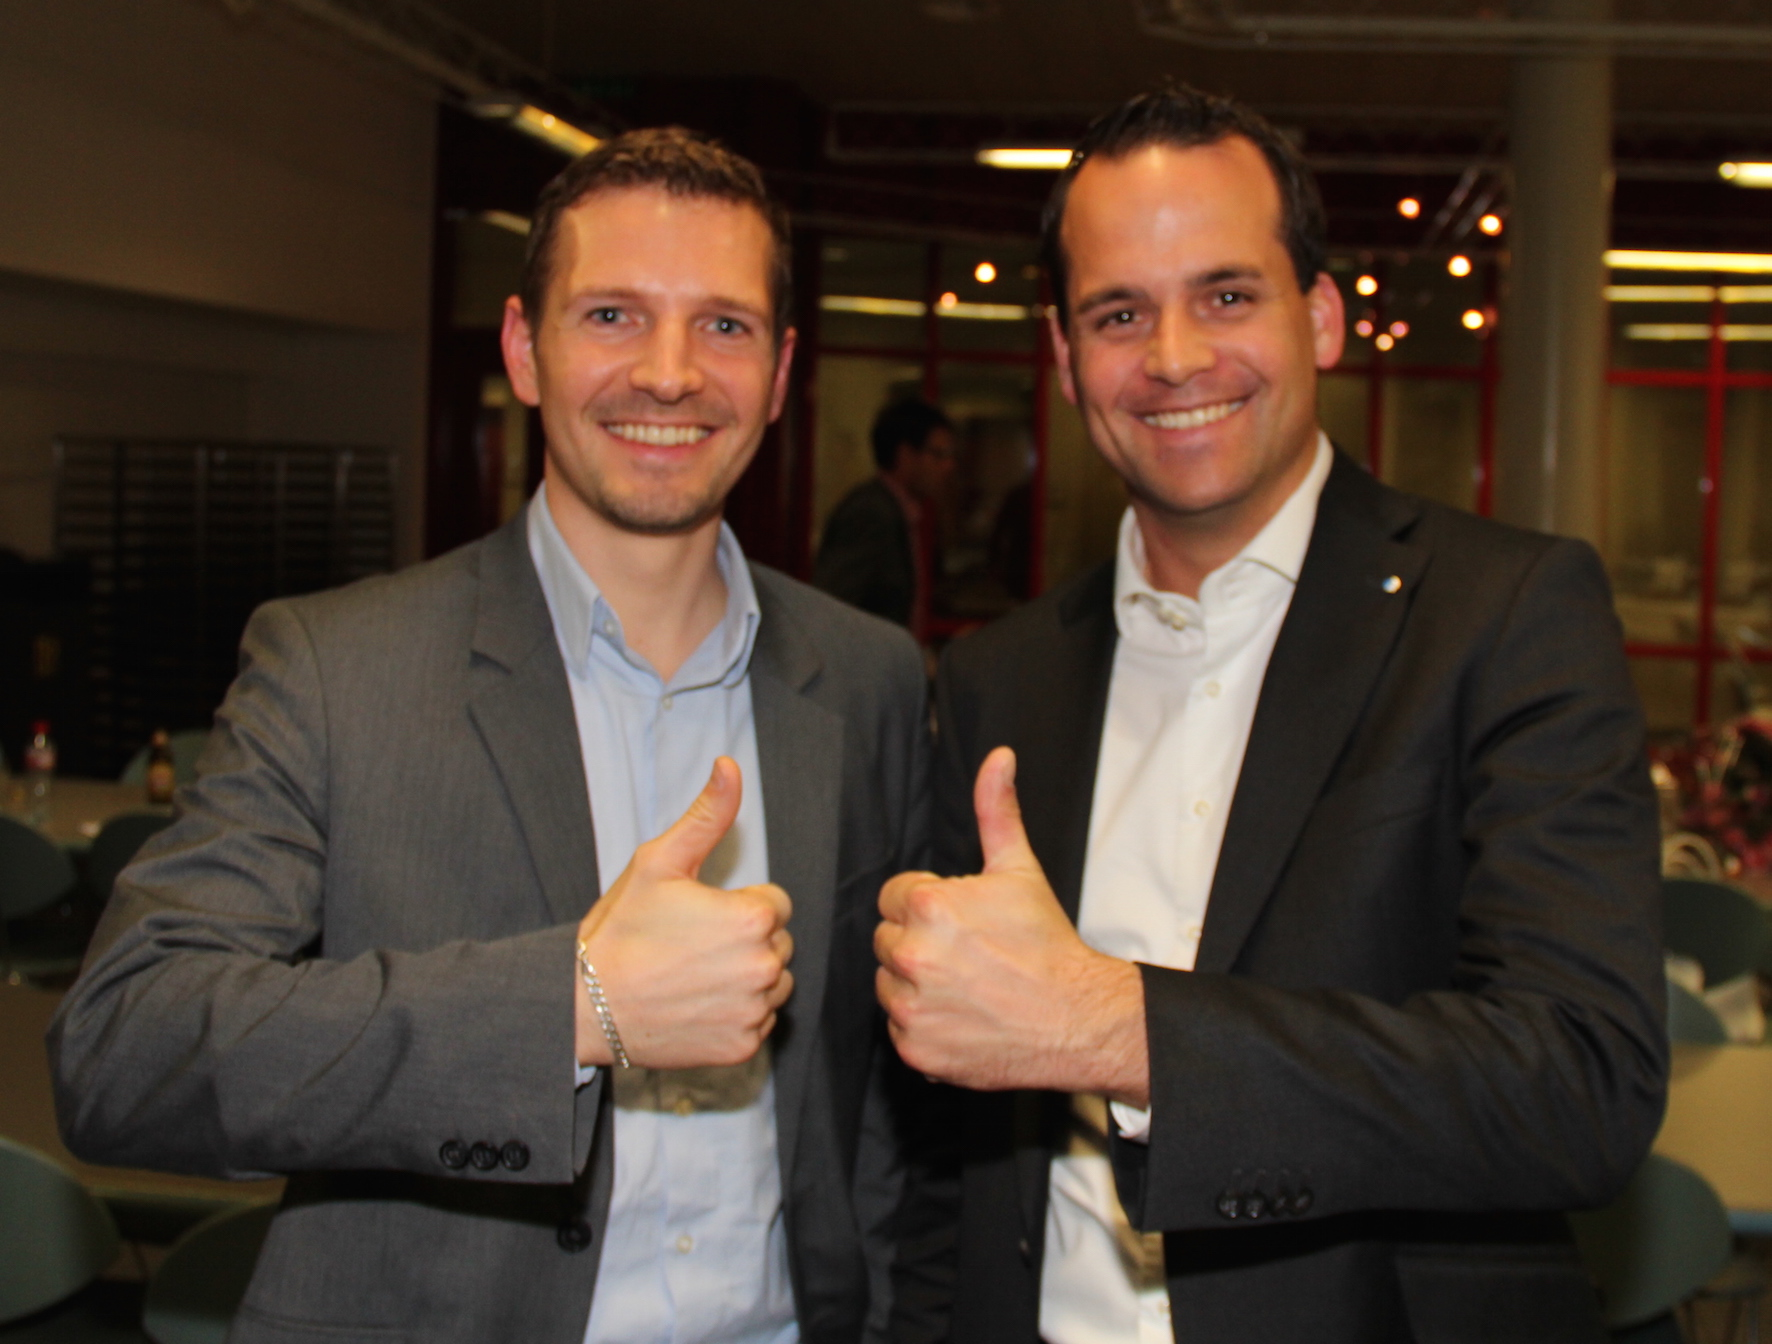 Florian Ulrich und Damian Müller 2014